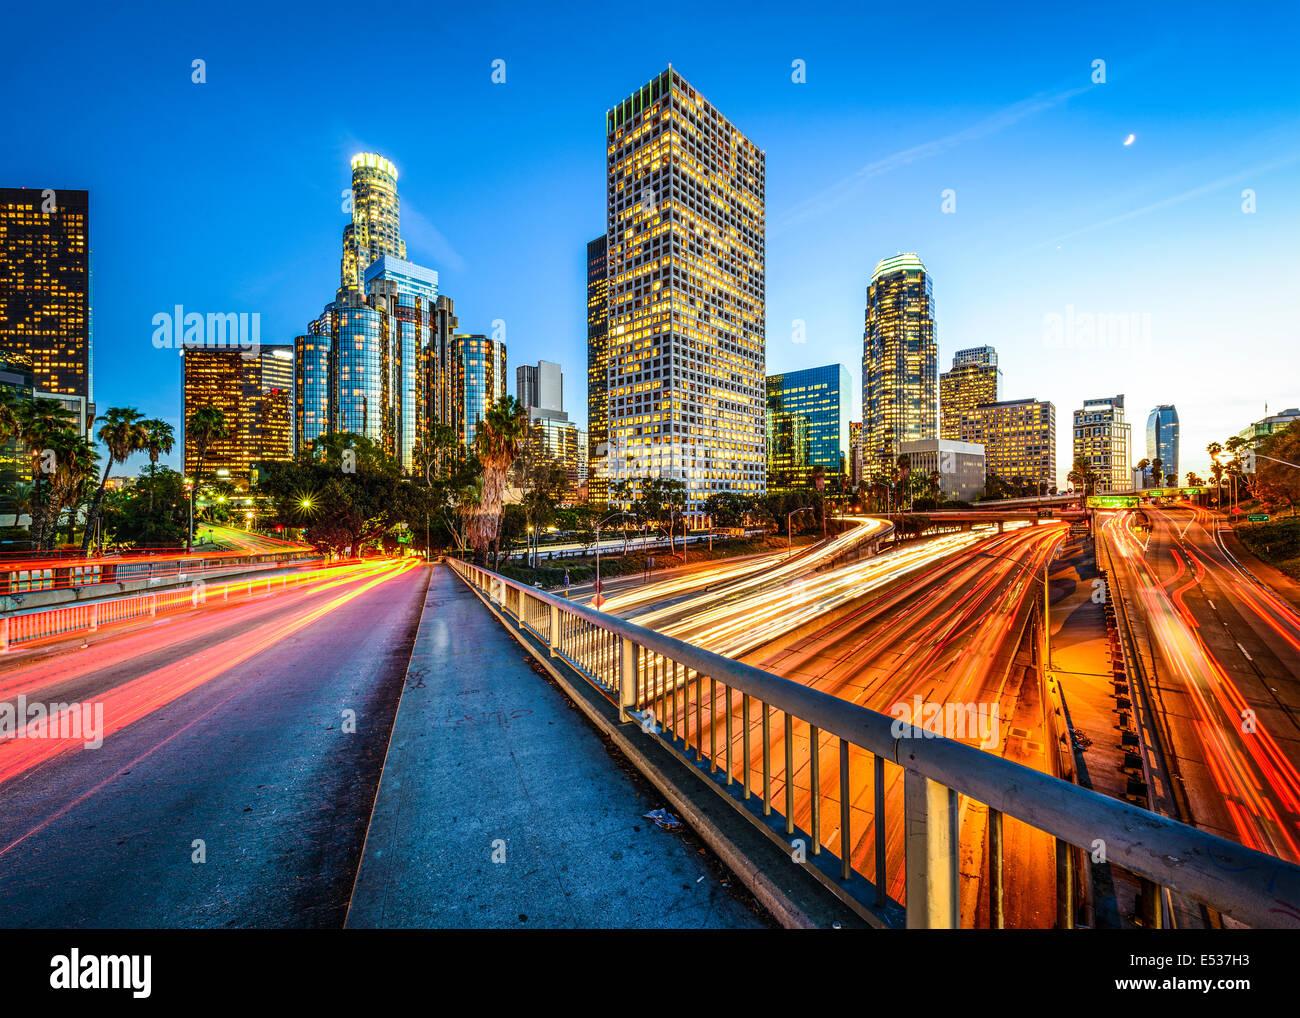 Los Angeles, Kalifornien, USA downtown Skyline bei Nacht. Stockbild